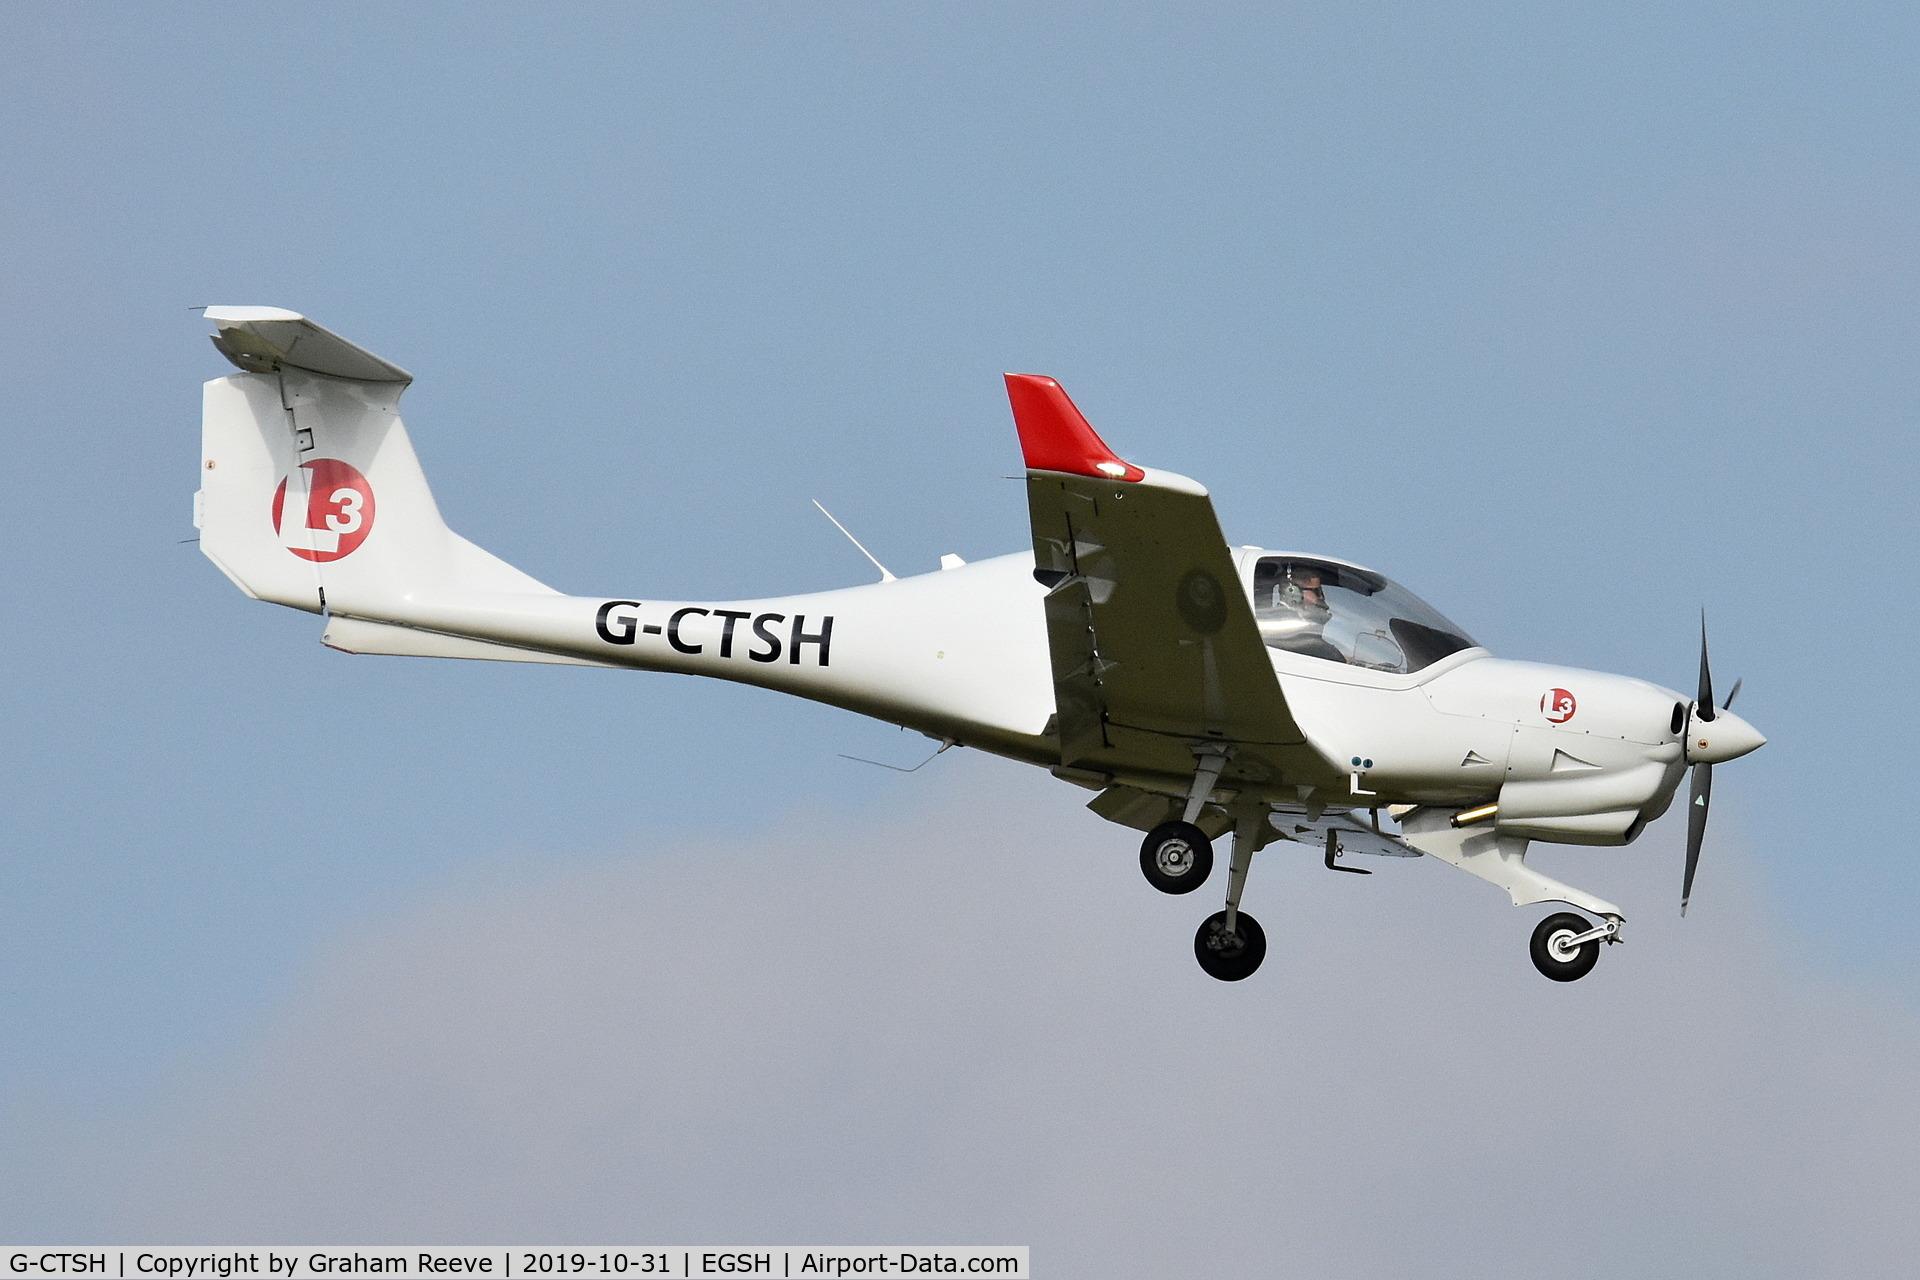 G-CTSH, 2016 Diamond DA-40 NG Diamond Star C/N 40.N310, Landing at Norwich.